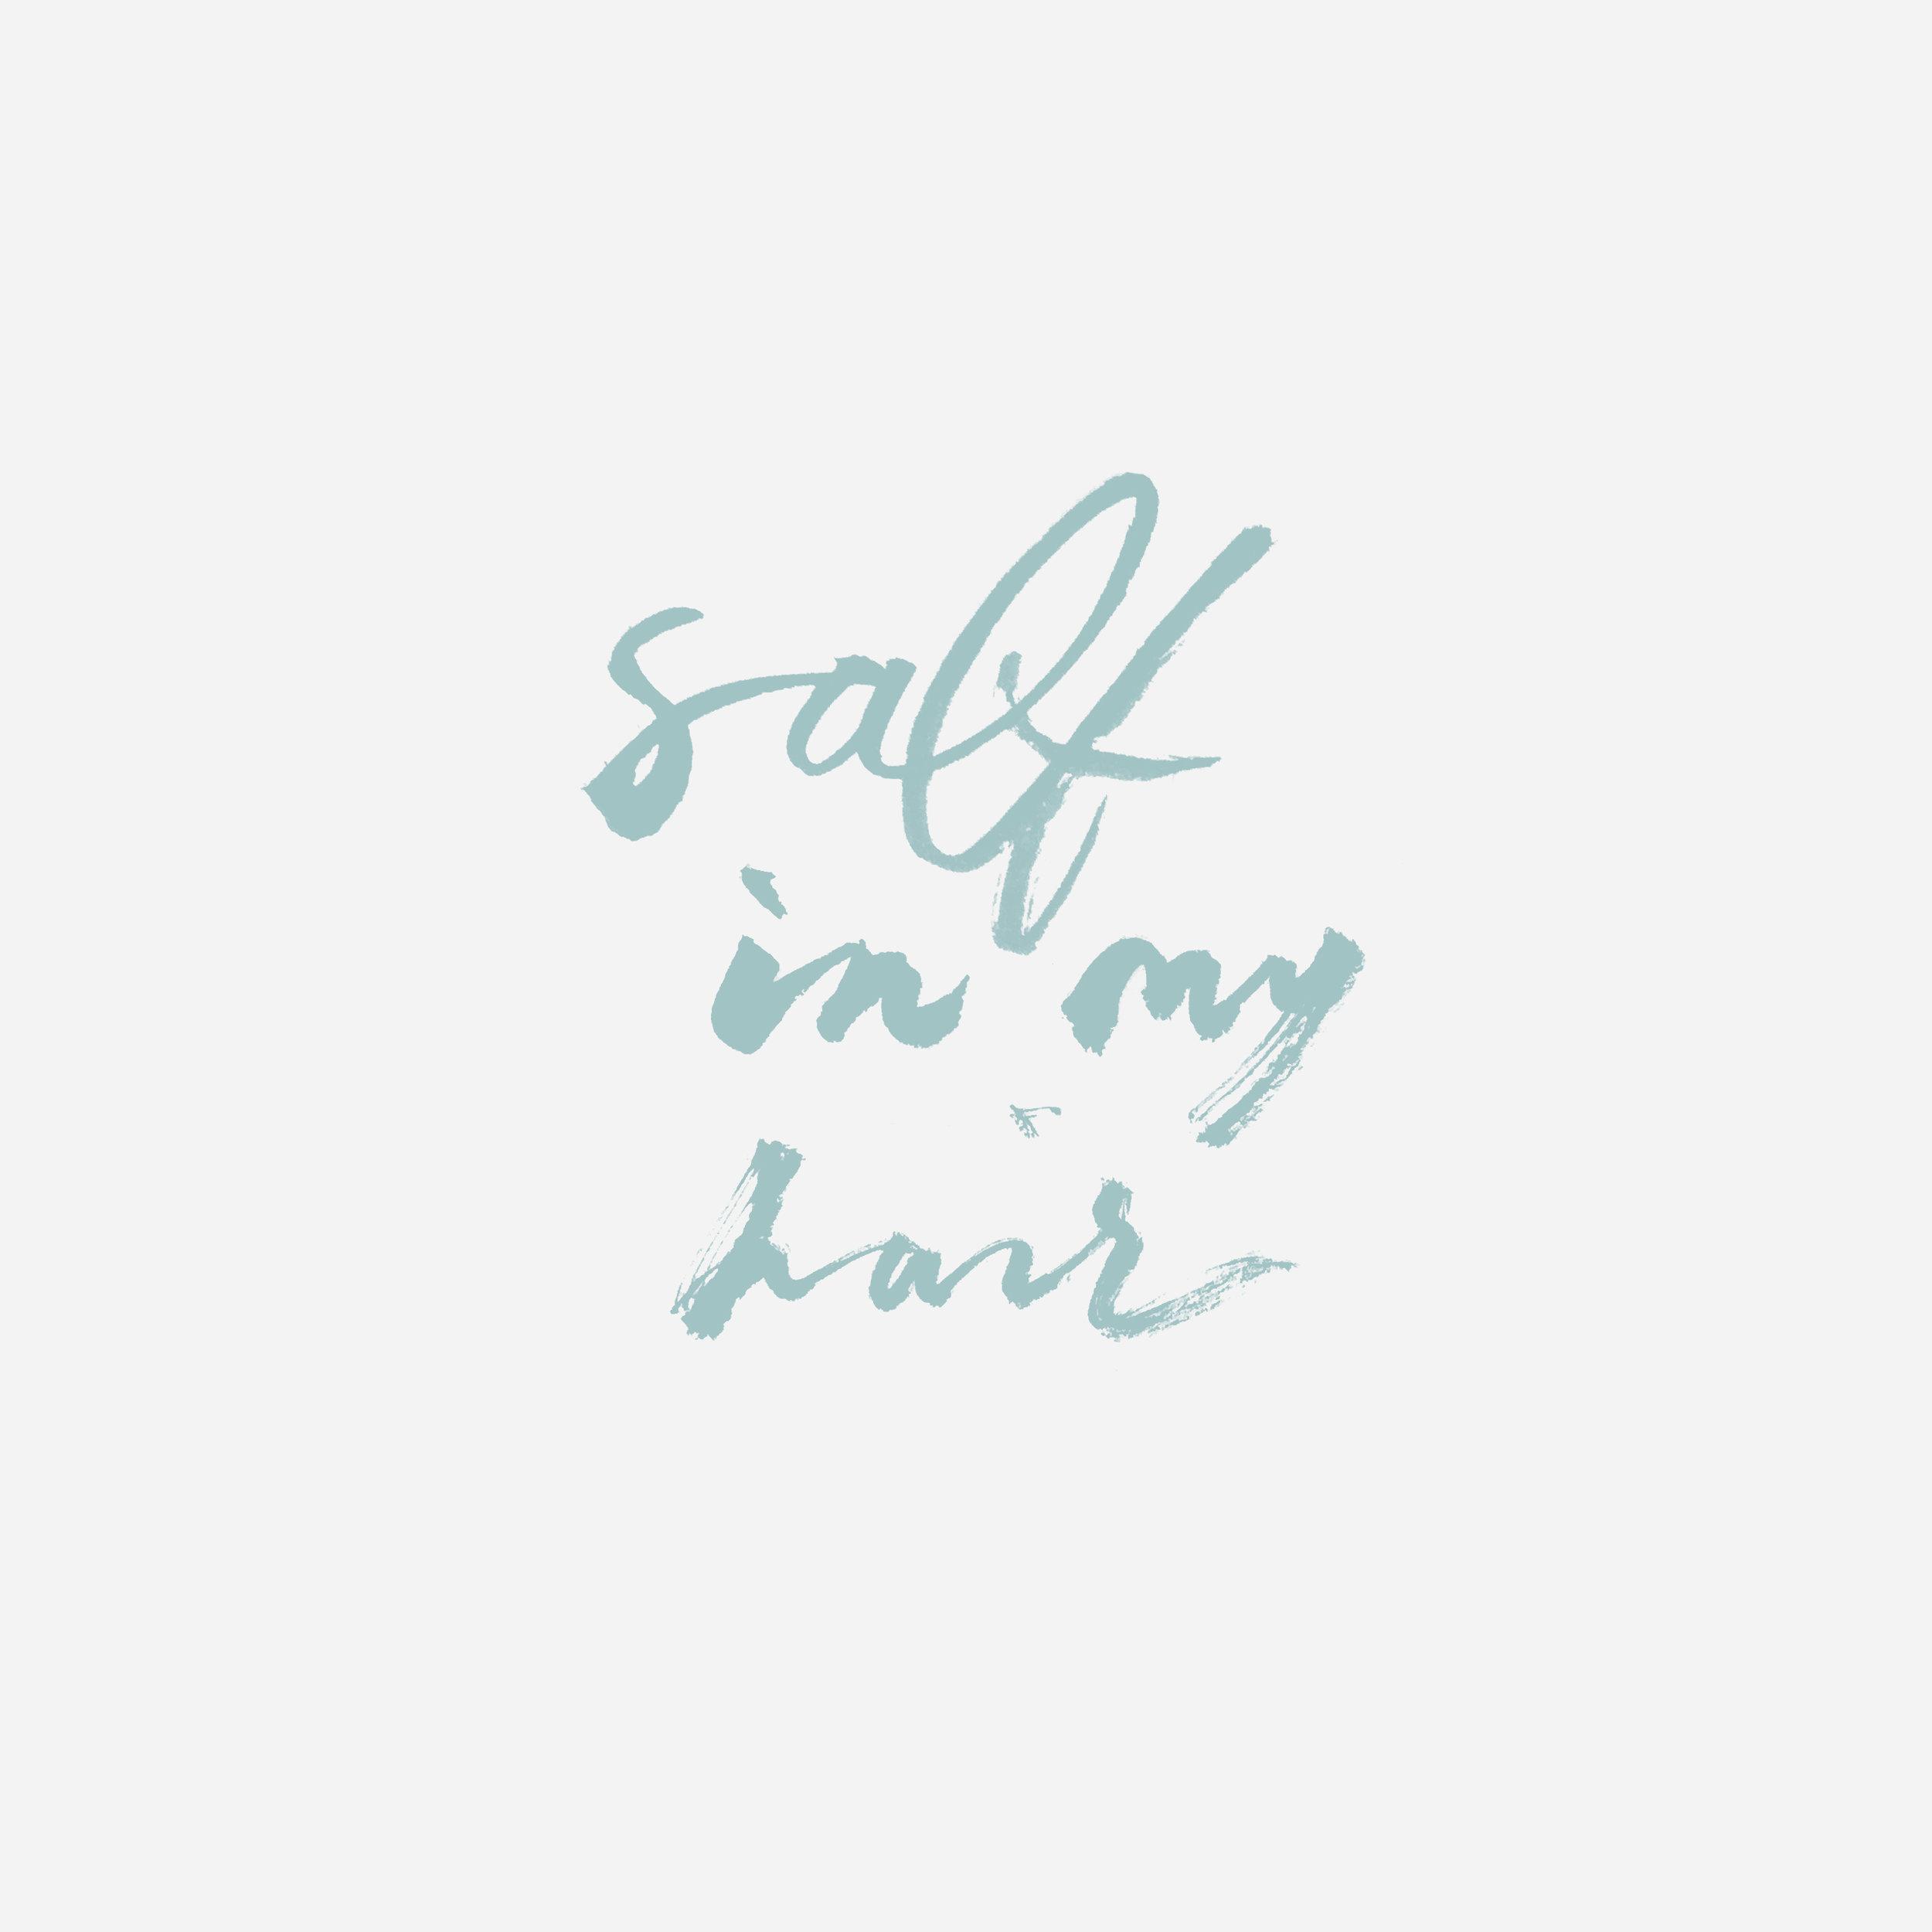 Salt Lettering by Belinda Love Lee